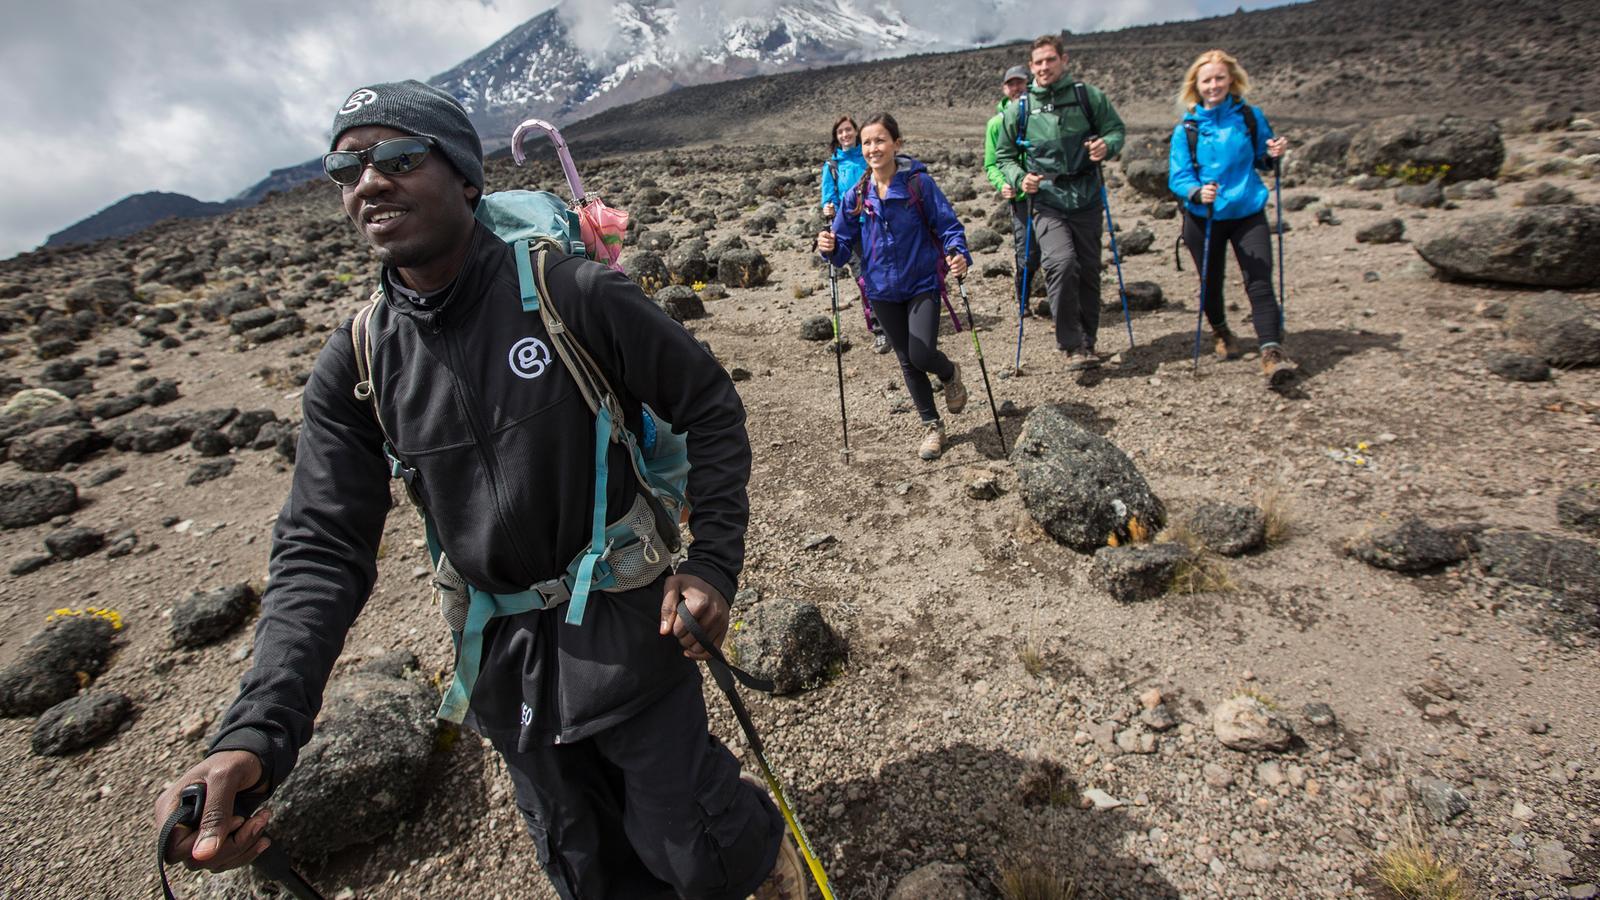 Kilimandscharo - Lemosho Route Gruppenreise Tansania traveljunkies